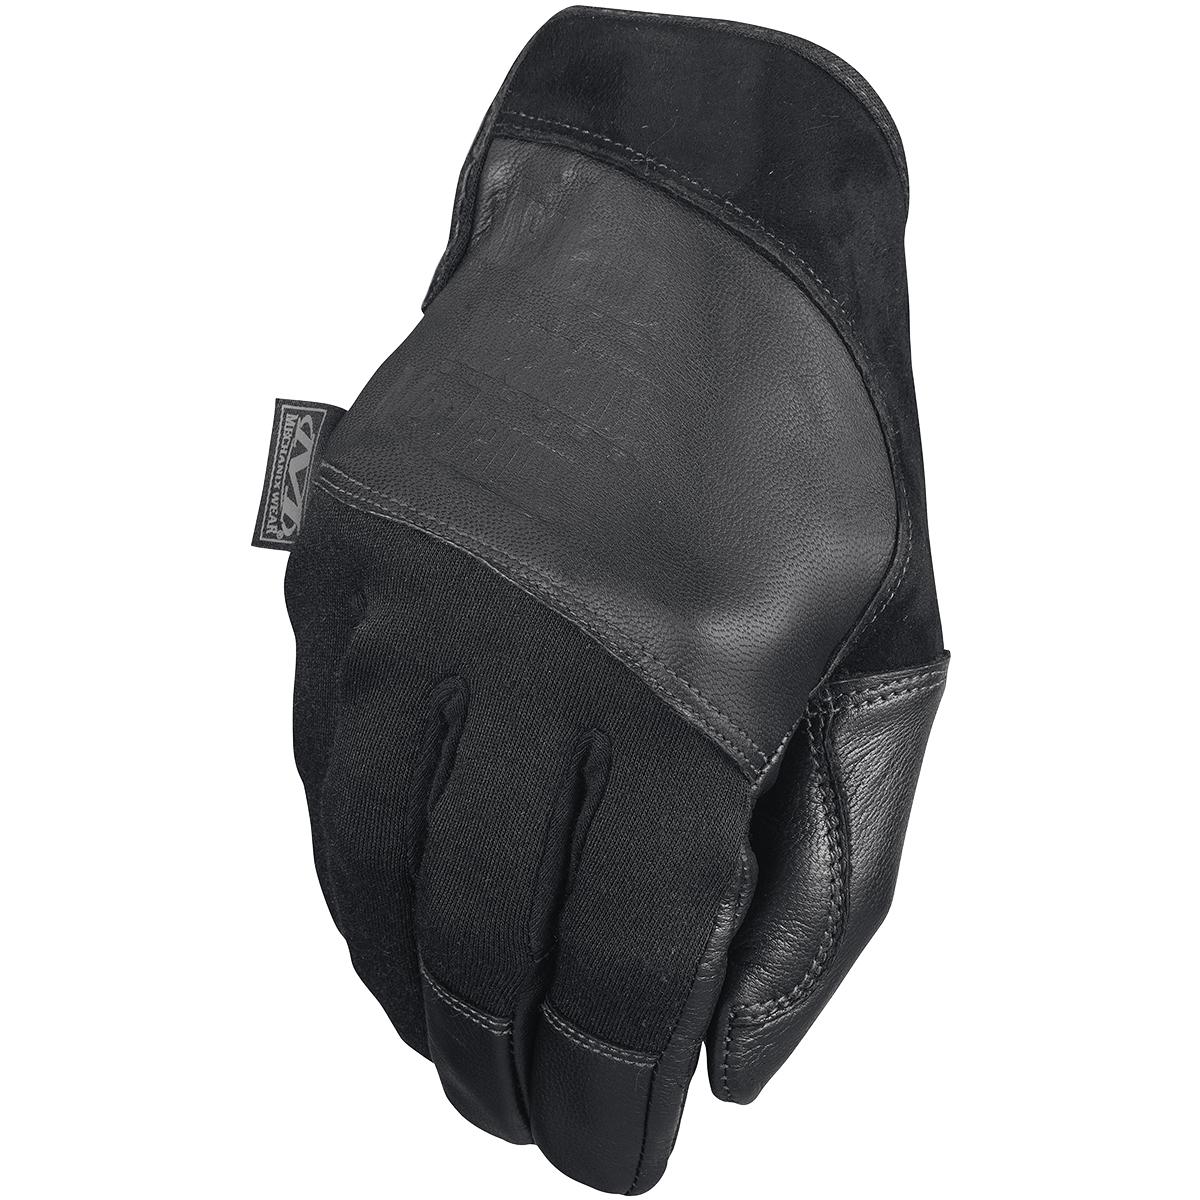 Black leather combat gloves - Mechanix Wear Tempest Tactical Combat Gloves Covert